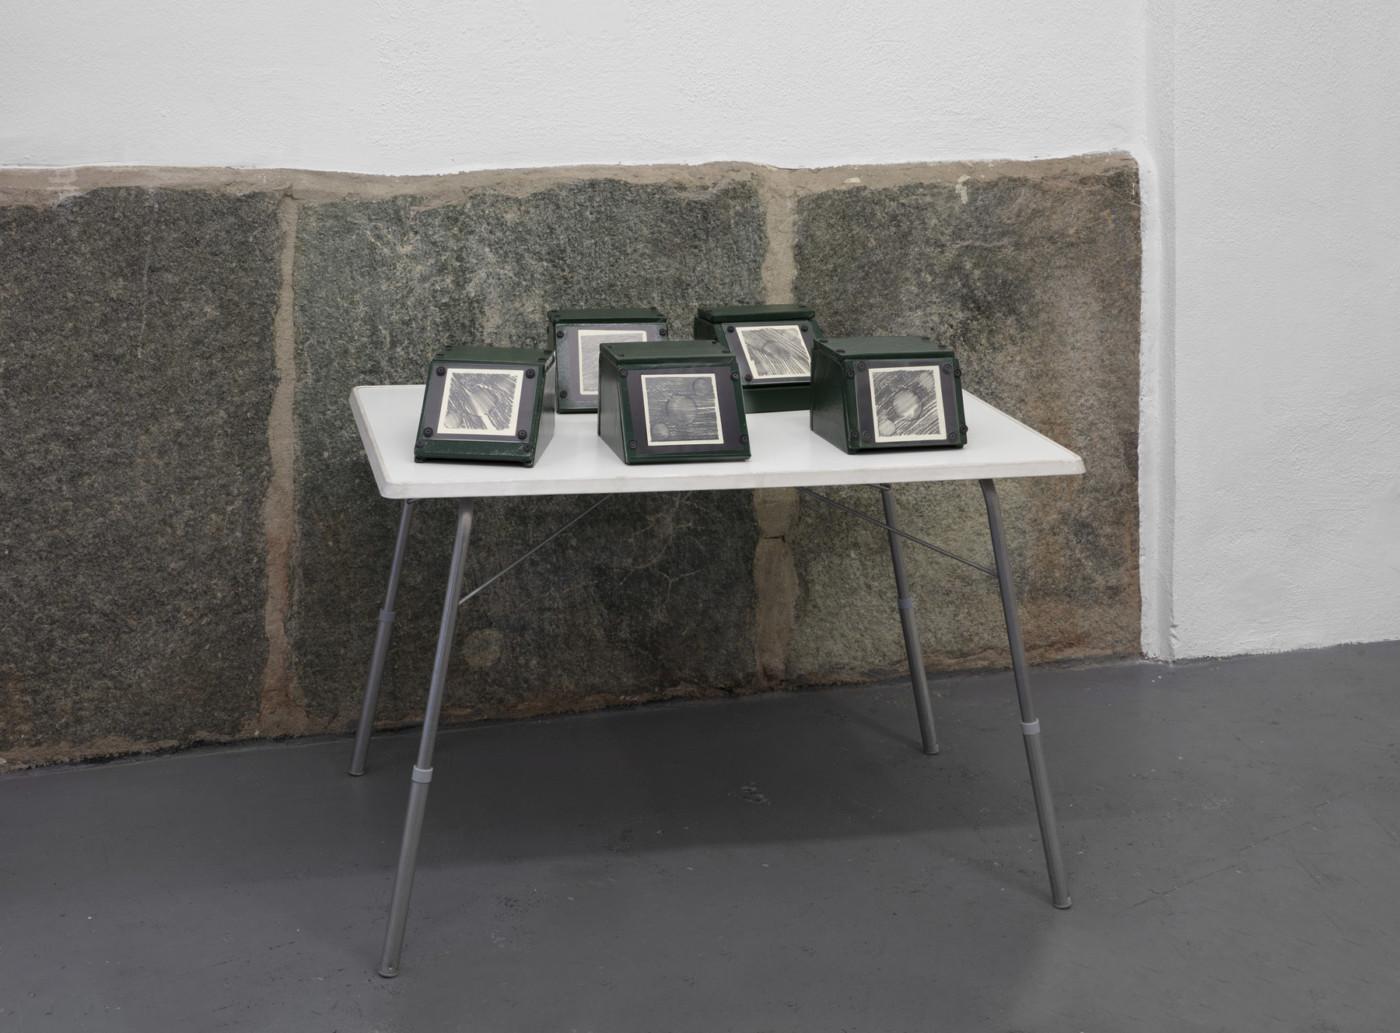 BRADLEY KRONZ  Untitled,  2020 Vinyl wood plexi pencil on paper 17,8 x 25,4 x 17,8 cm / 7 x 10 x 7 in - High Art Gallery Paris